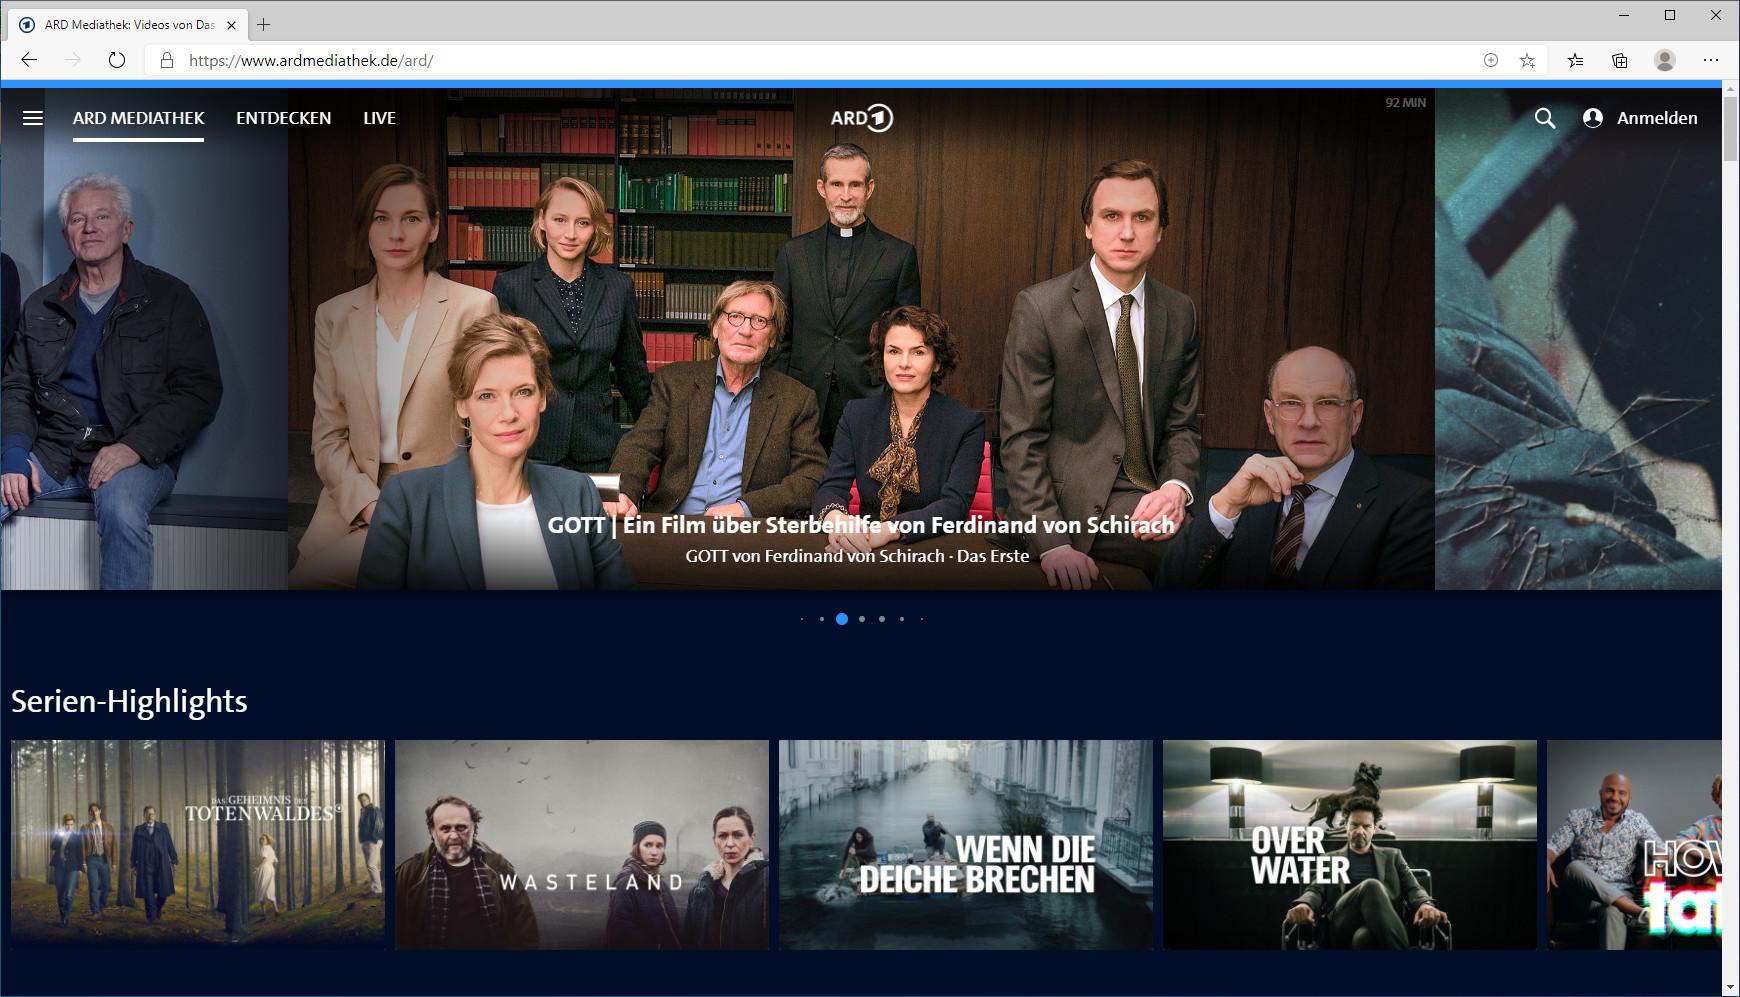 Screenshot 1 - ARD-Mediathek